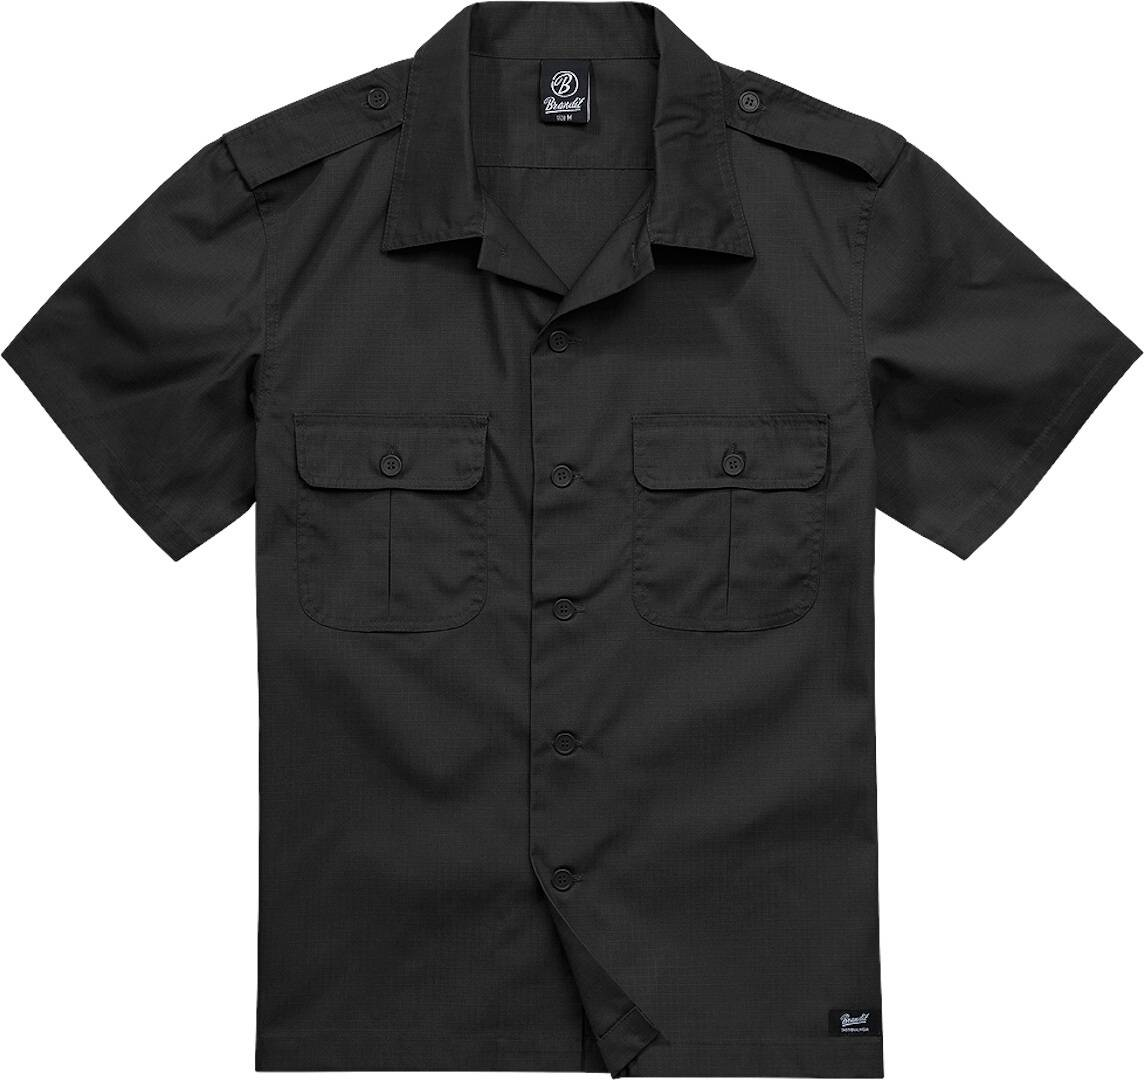 Brandit US Ripstop Paita  - Musta - Size: S